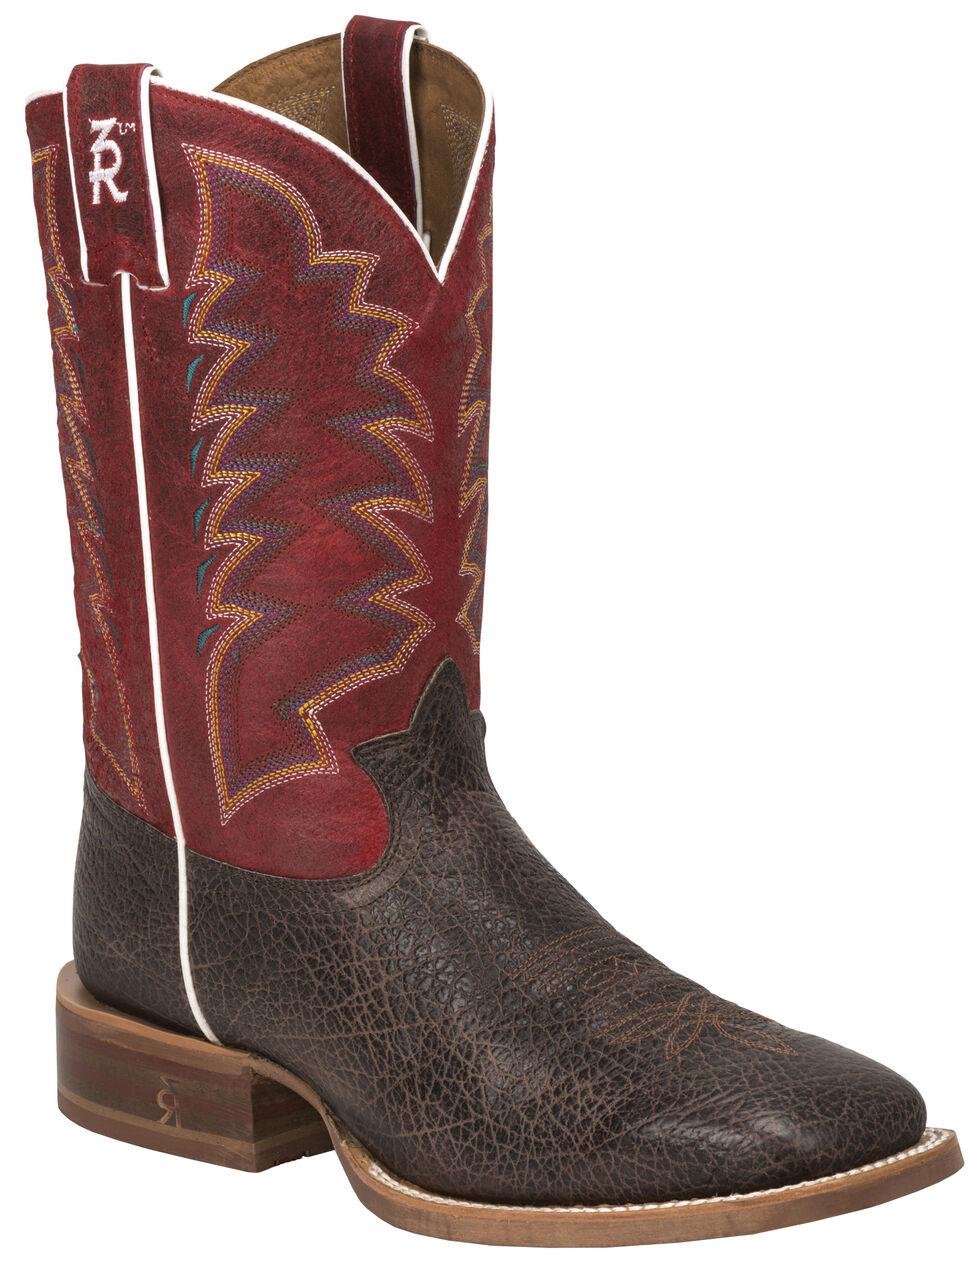 Tony Lama Cafe Bonham 3R Stockman Boots - Square Toe, Dark Brown, hi-res